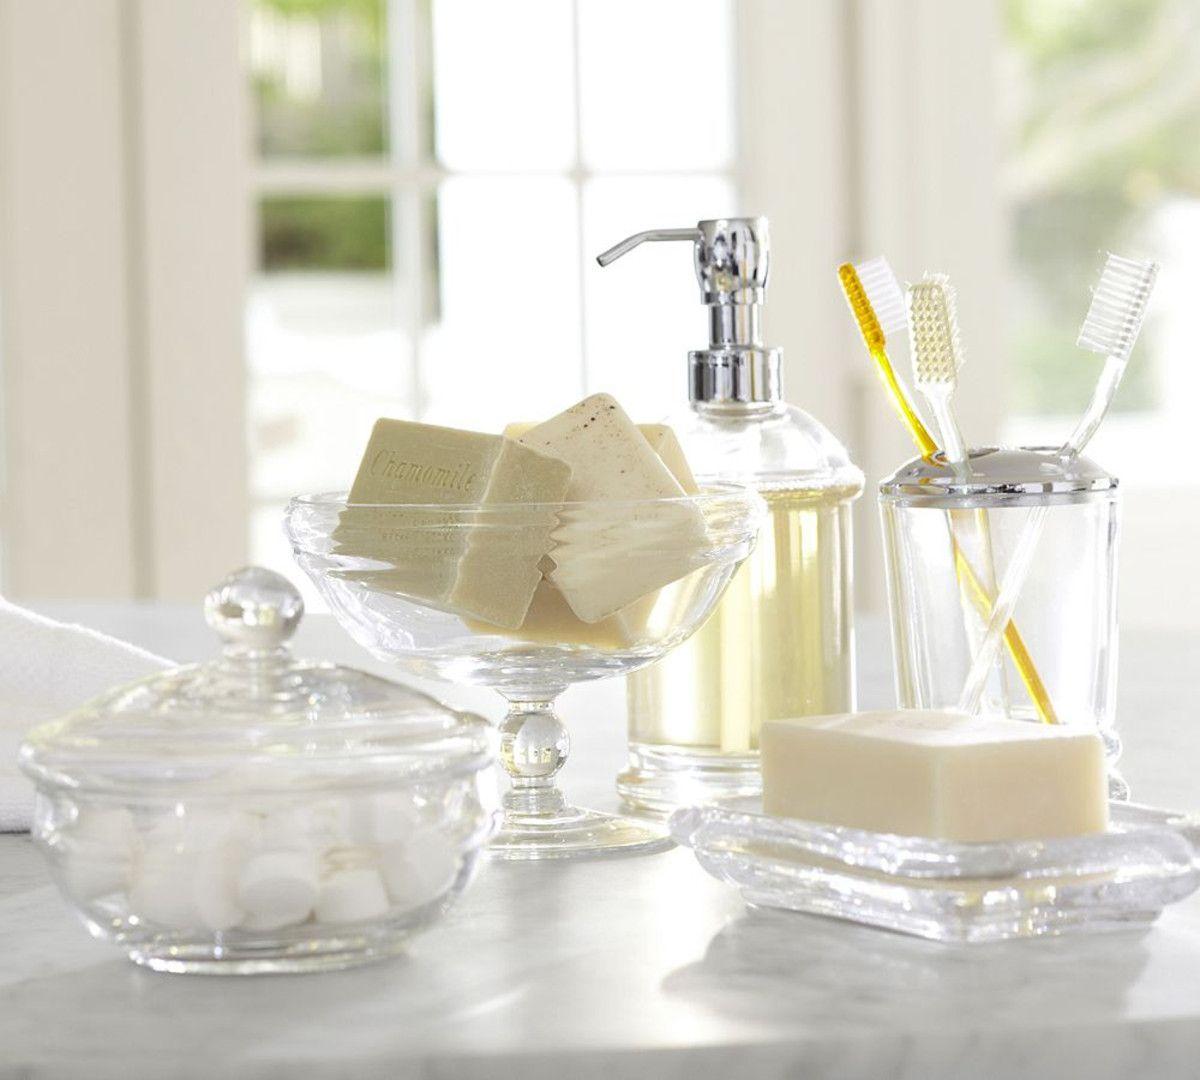 PB Classic Glass Bath Accessories | Small Bathrooms | Pinterest ...